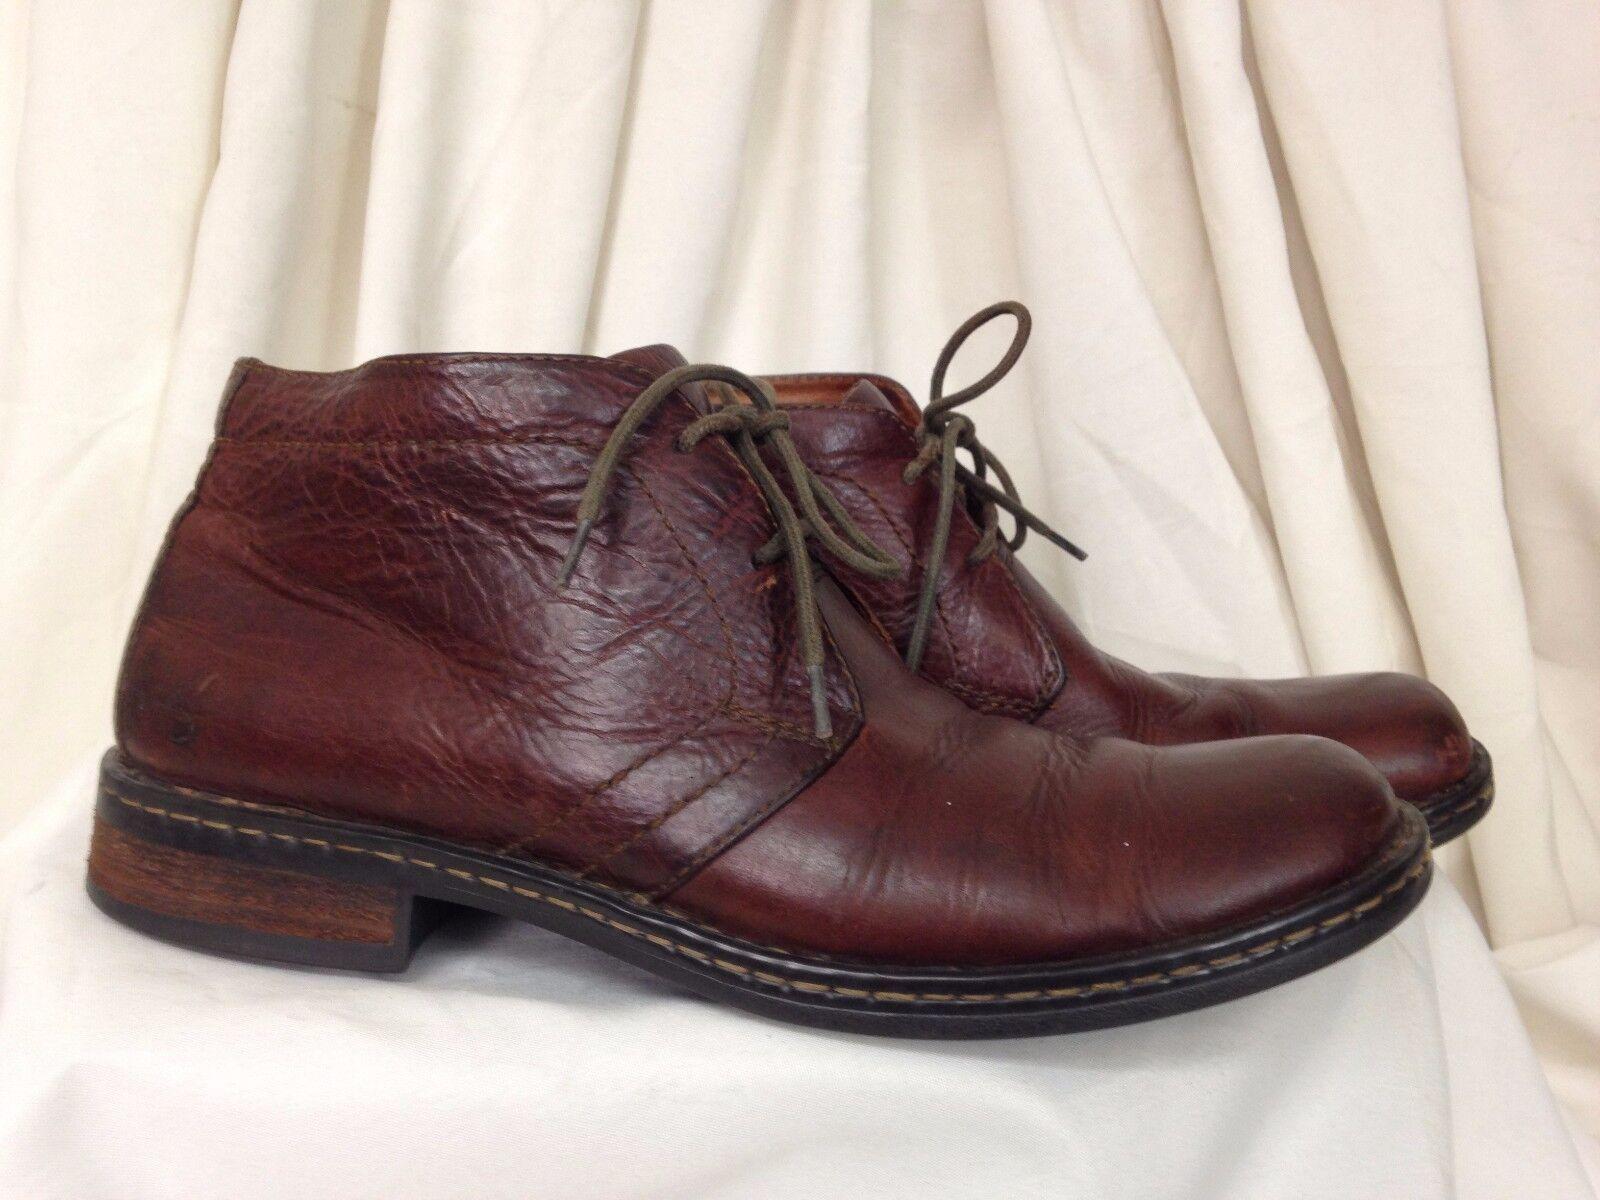 Born Footwear Brown Plain Toe Toe Toe Derby Styling Men's Leather Ankle Boot - US 11.5 d799fc